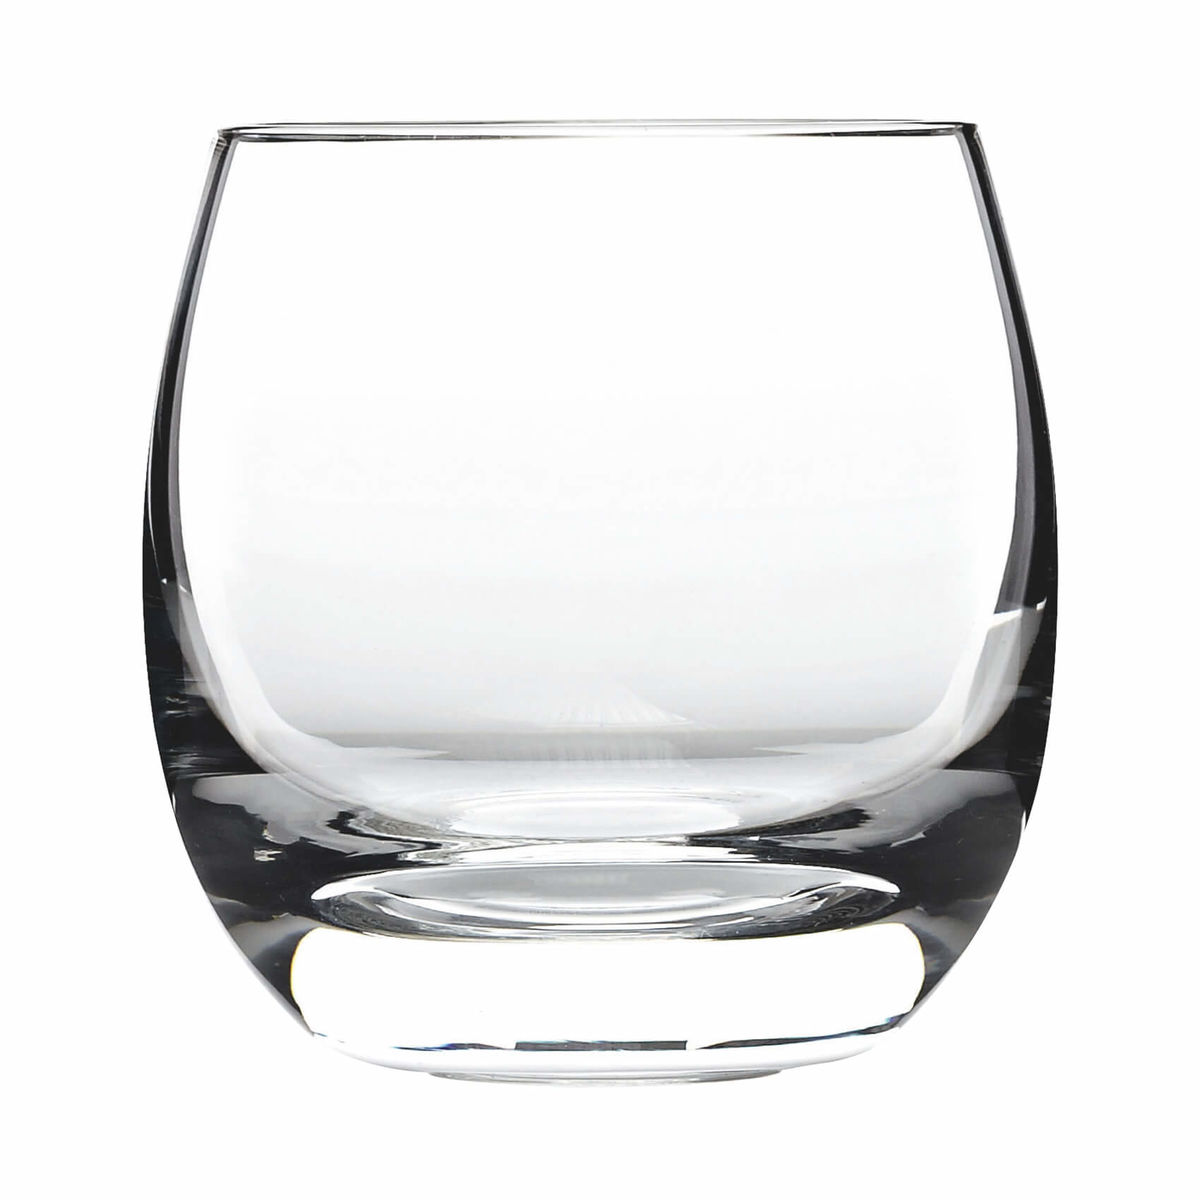 Ritzenhoff Aspergo Sykes Langlois Tumbler Trinkglas 6 Stück